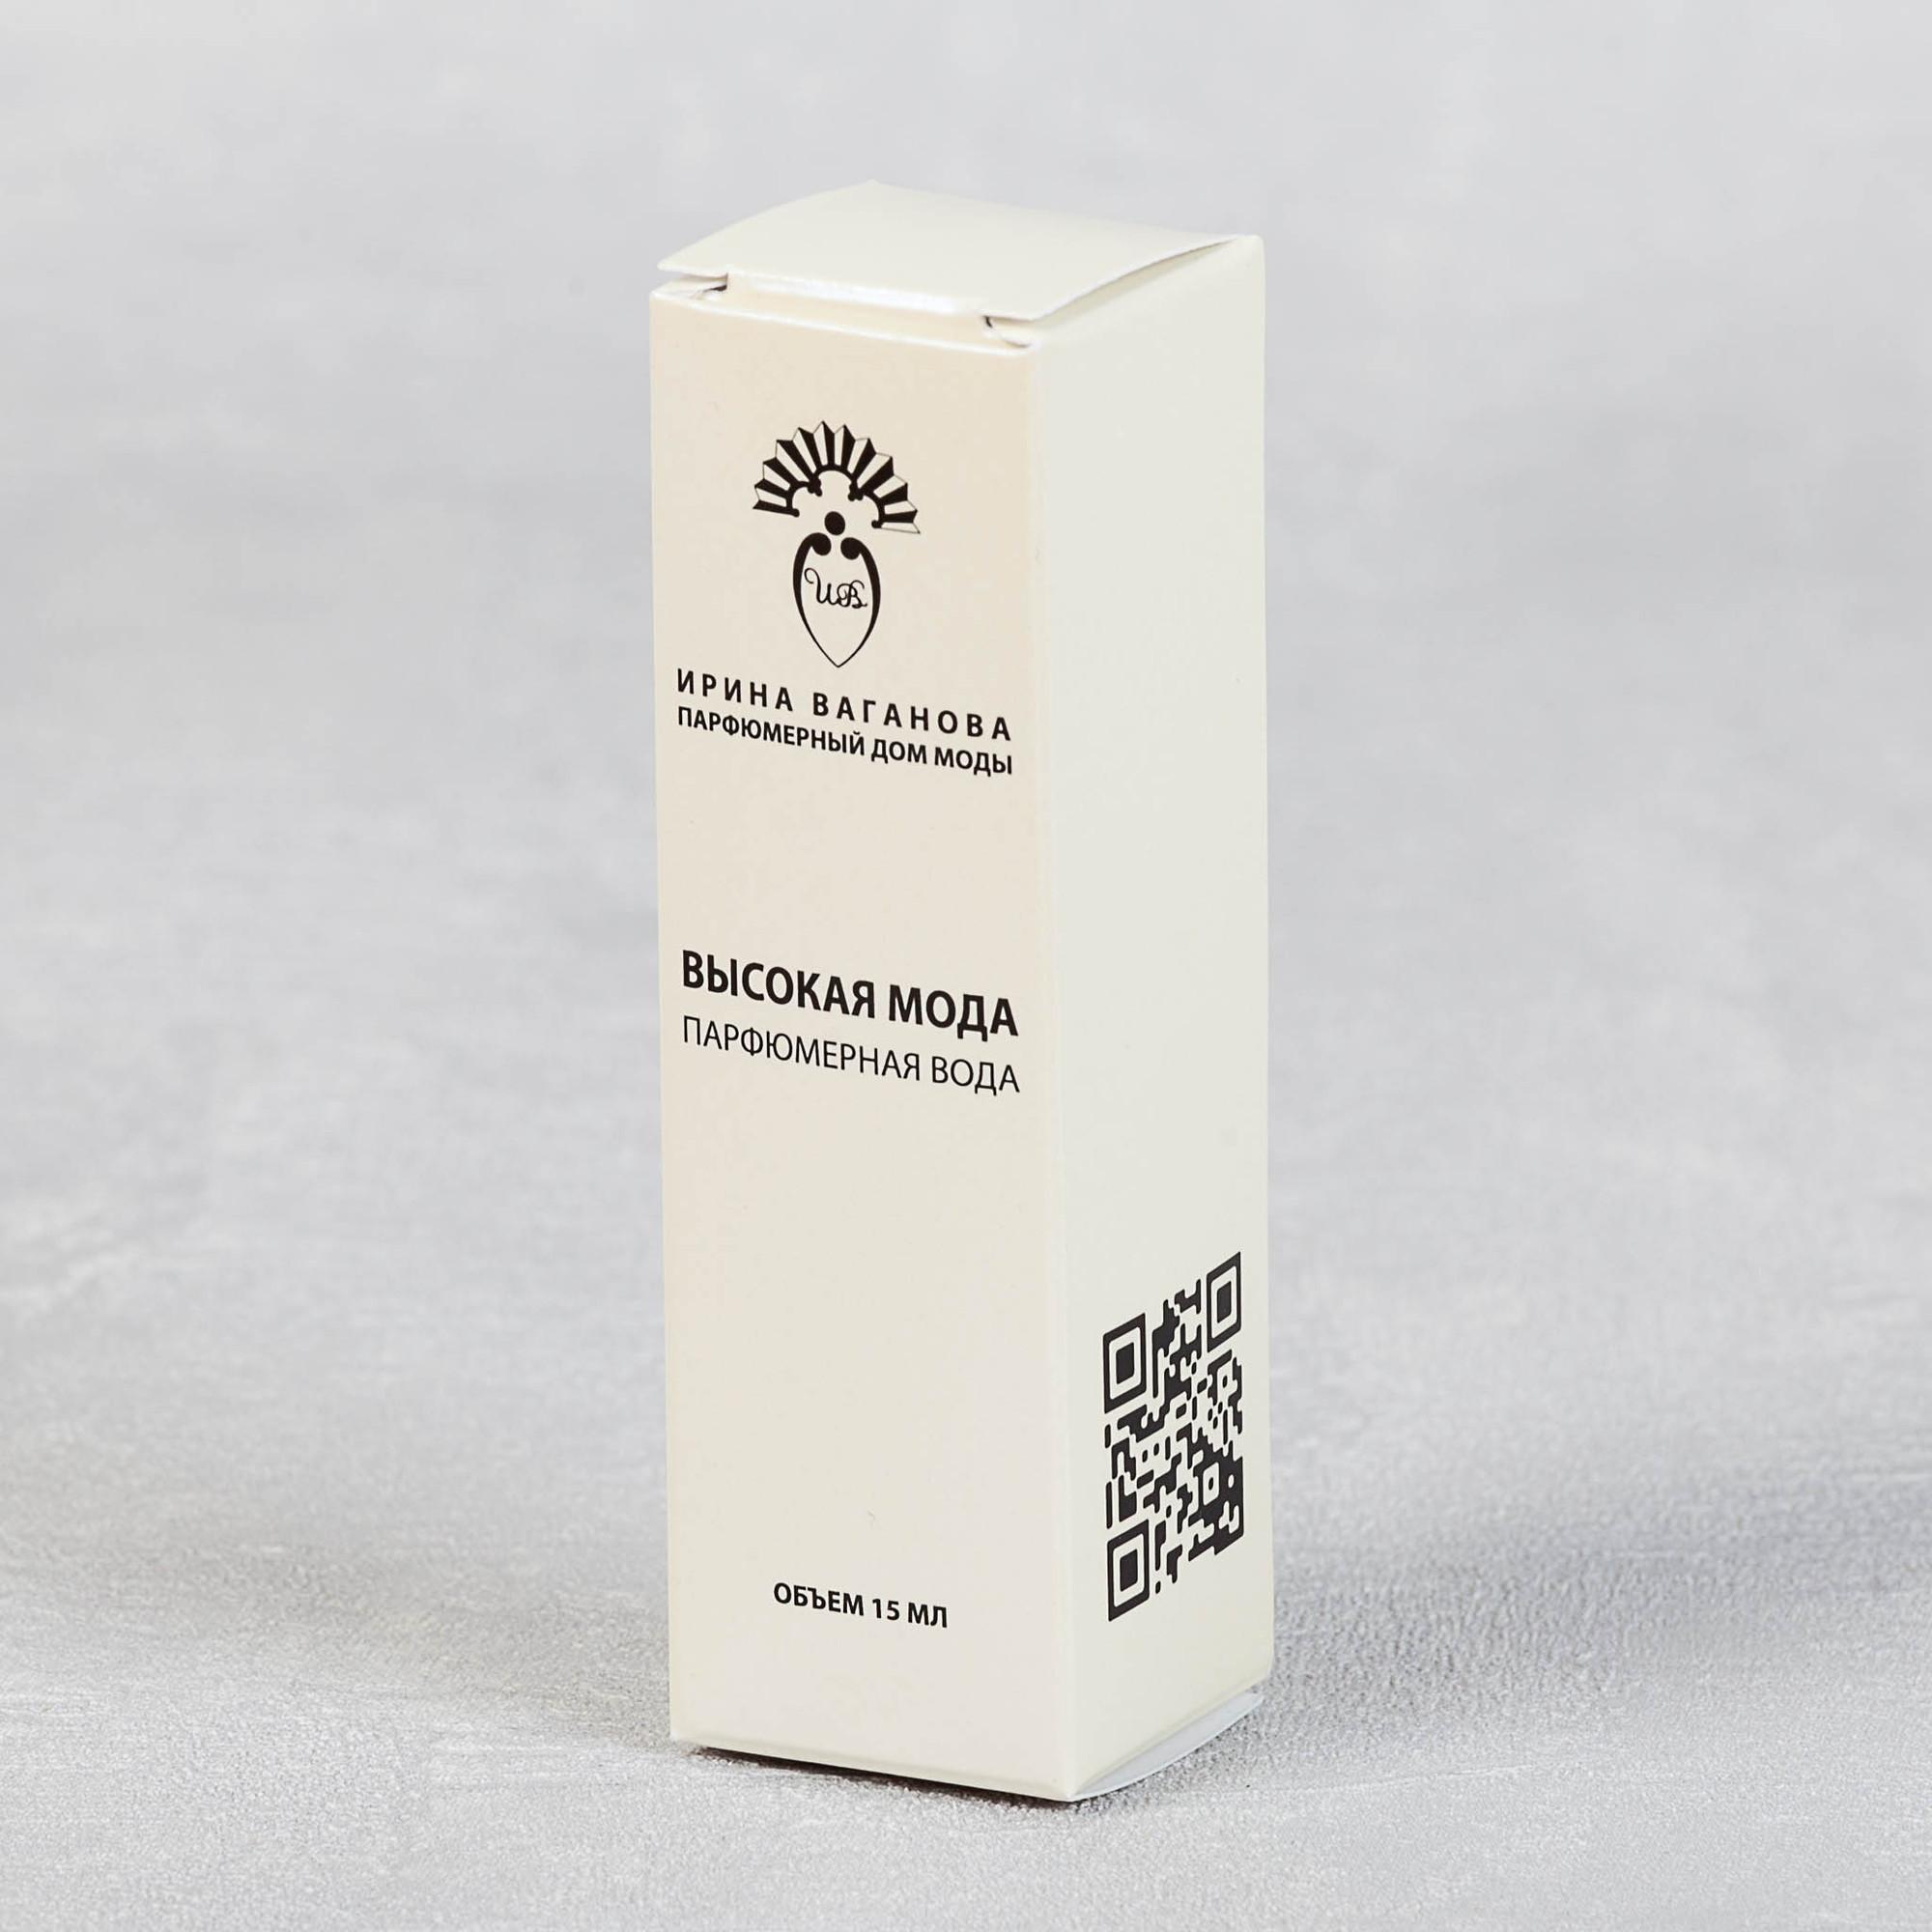 Коробочка для духов из переливающегося маджестика